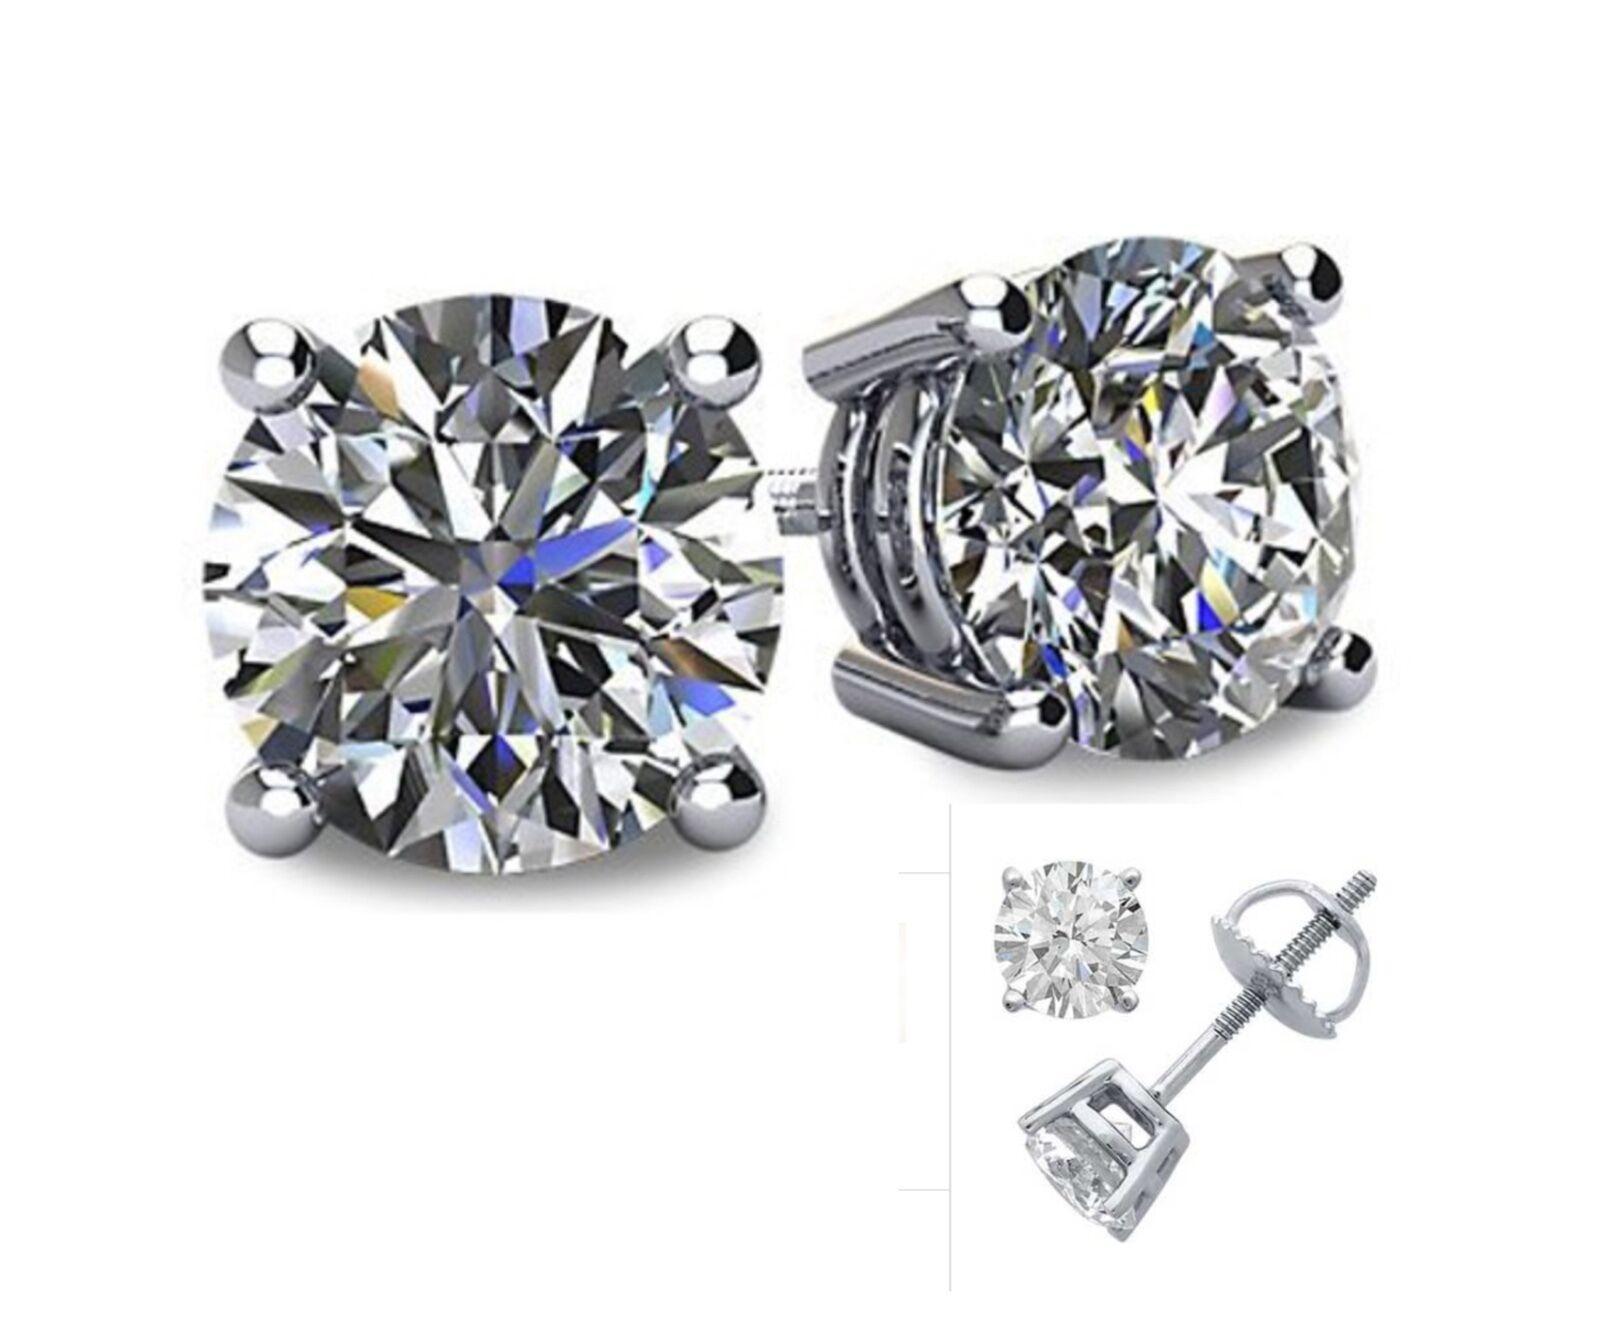 $24.99 - 1CT Lab Created Diamond 14K White Gold Round Cut Screw-Back Stud Earrings